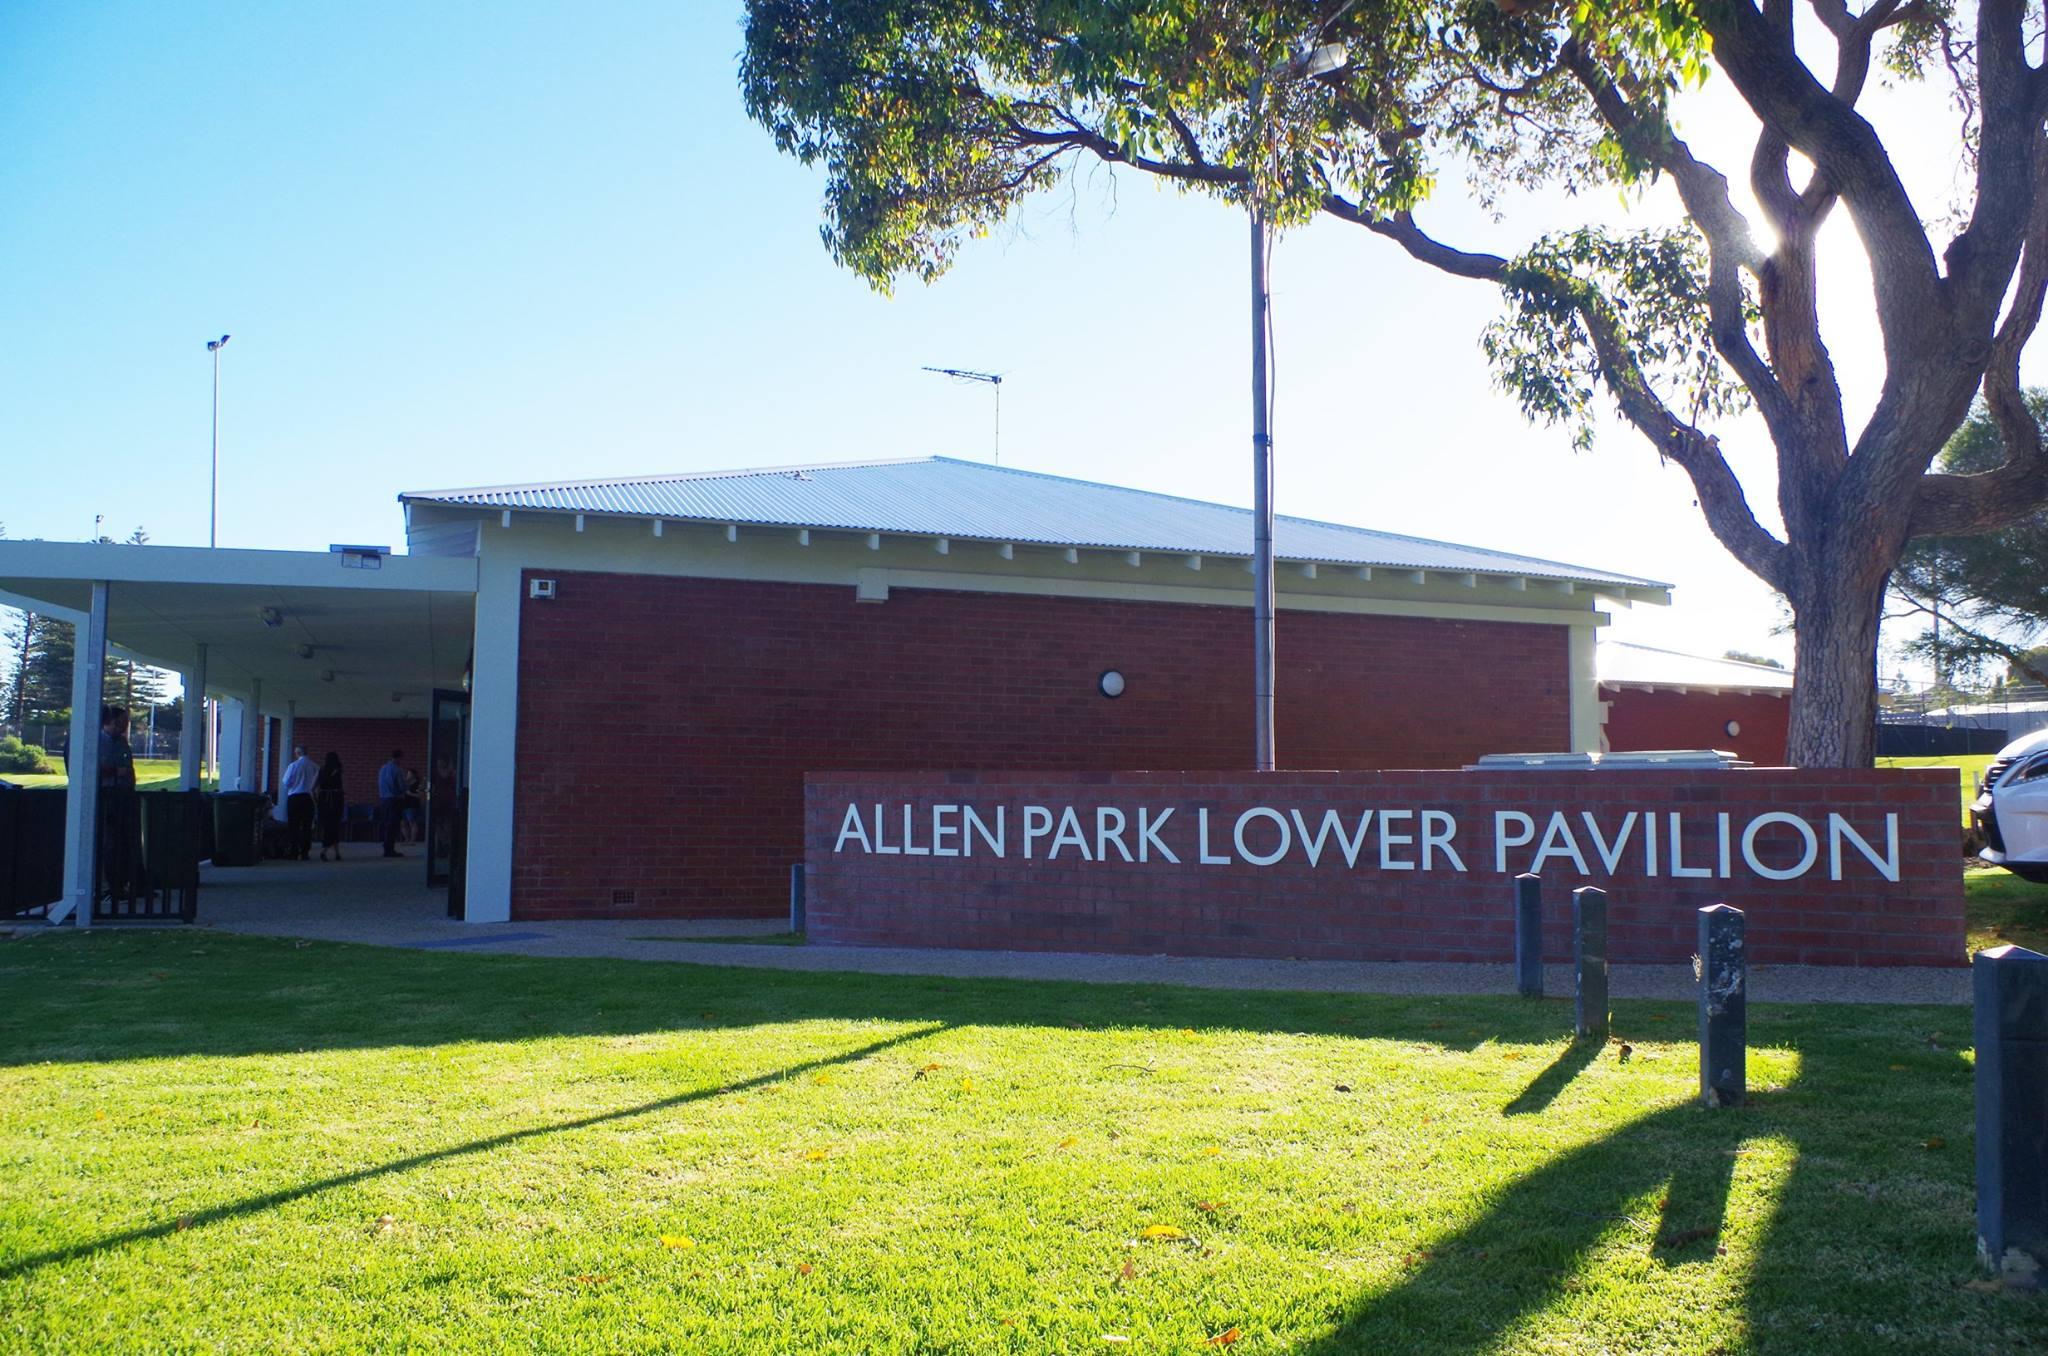 City of Nedlands celebrates opening of Allen Park Lower Pavilion in Swanbourne